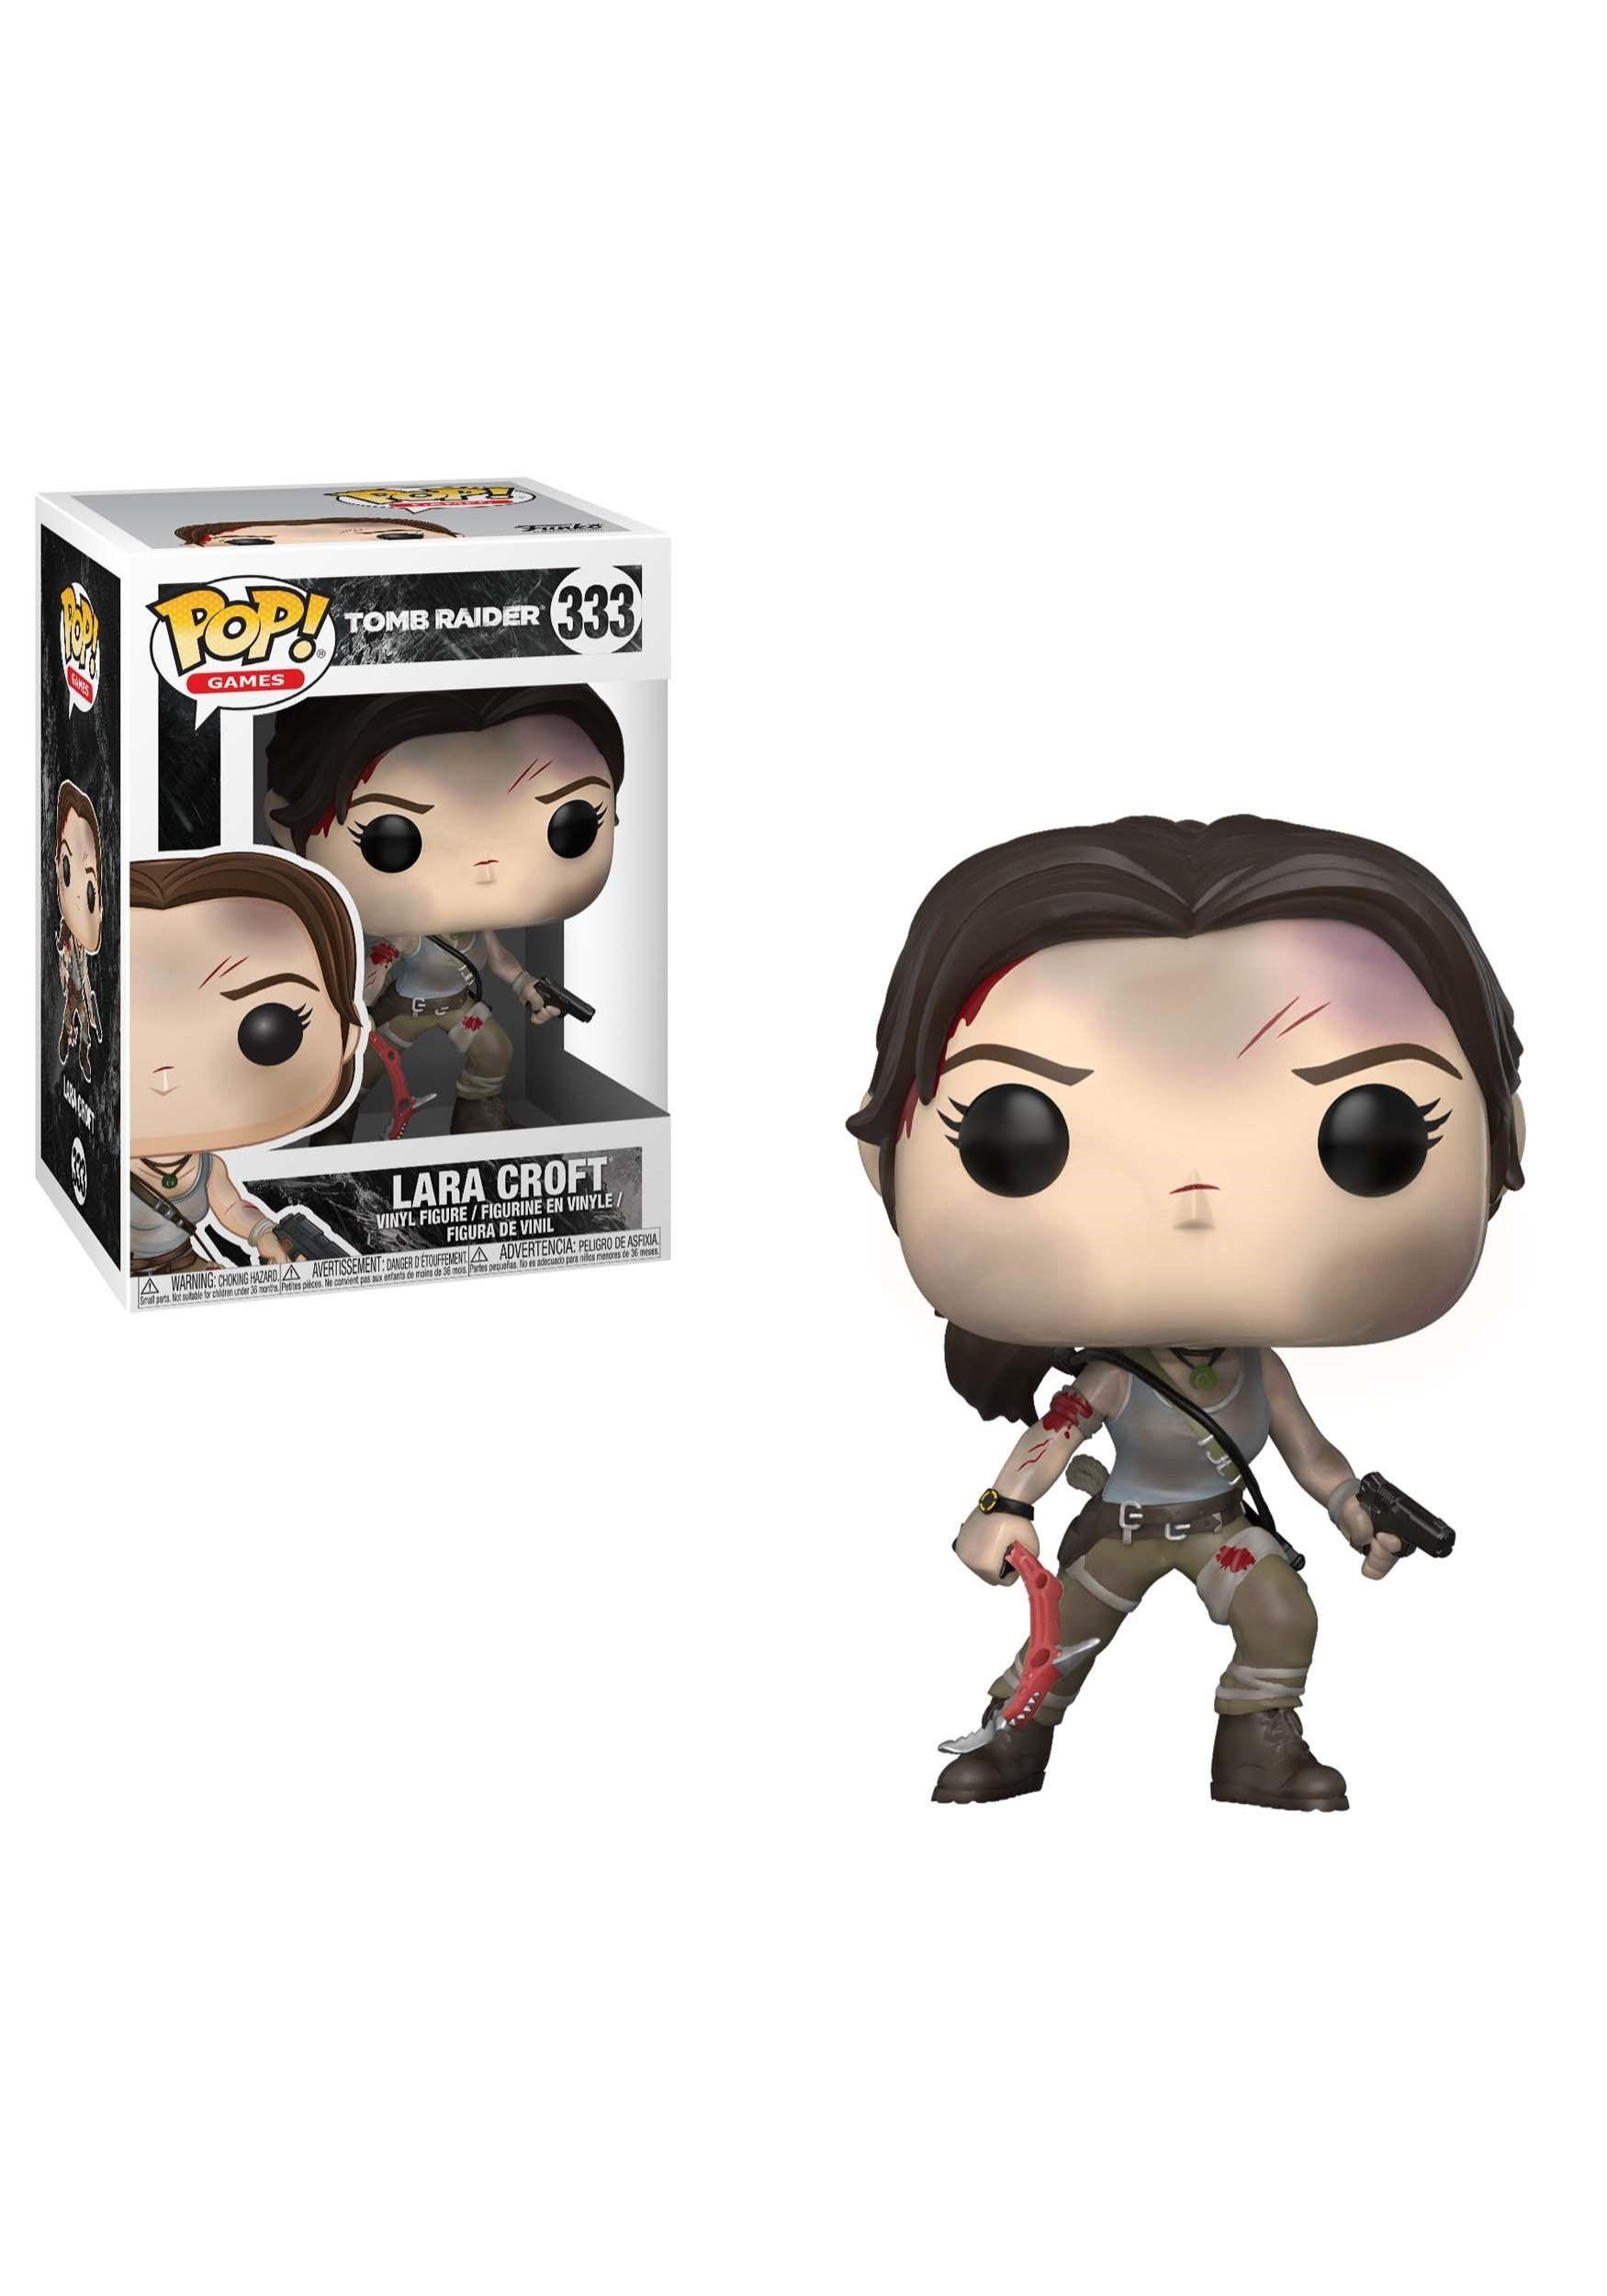 Pop Games Tomb Raider Lara Croft Vinyl Figure In 2020 Tomb Raider Tomb Raider Lara Croft Vinyl Figures